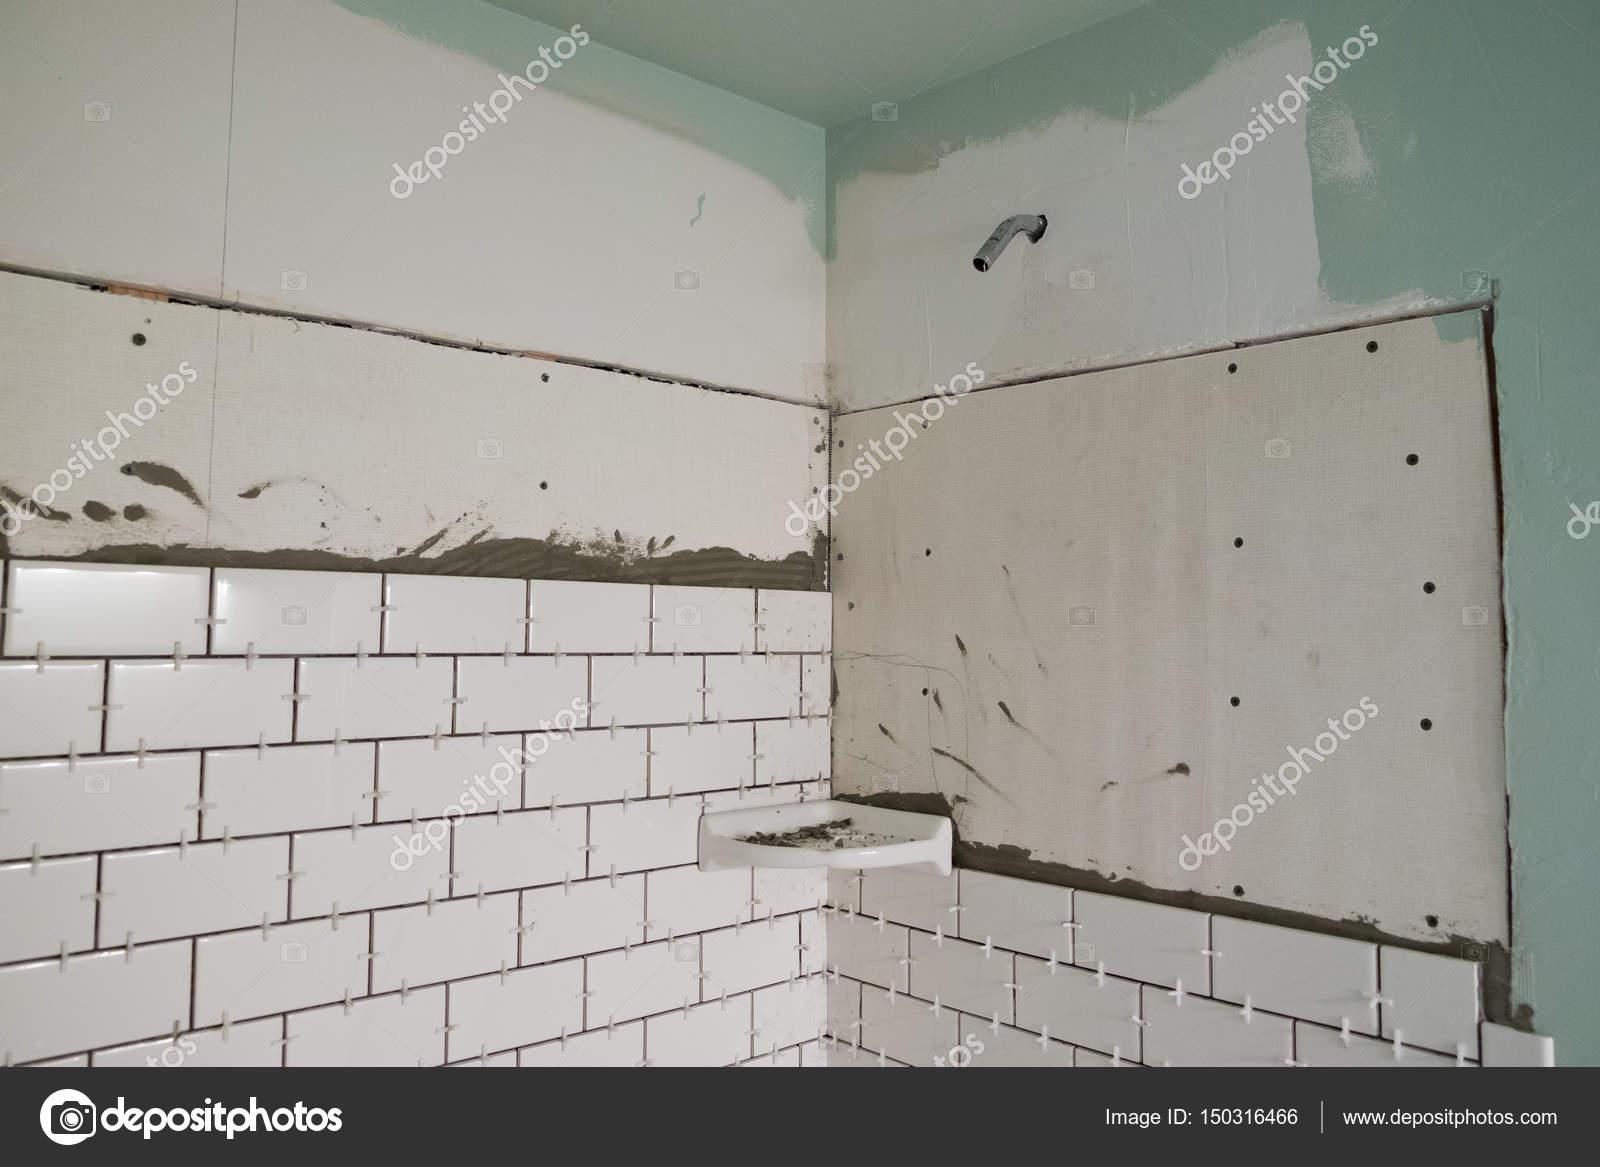 Bianco della metropolitana piastrelle vasca surround u foto stock